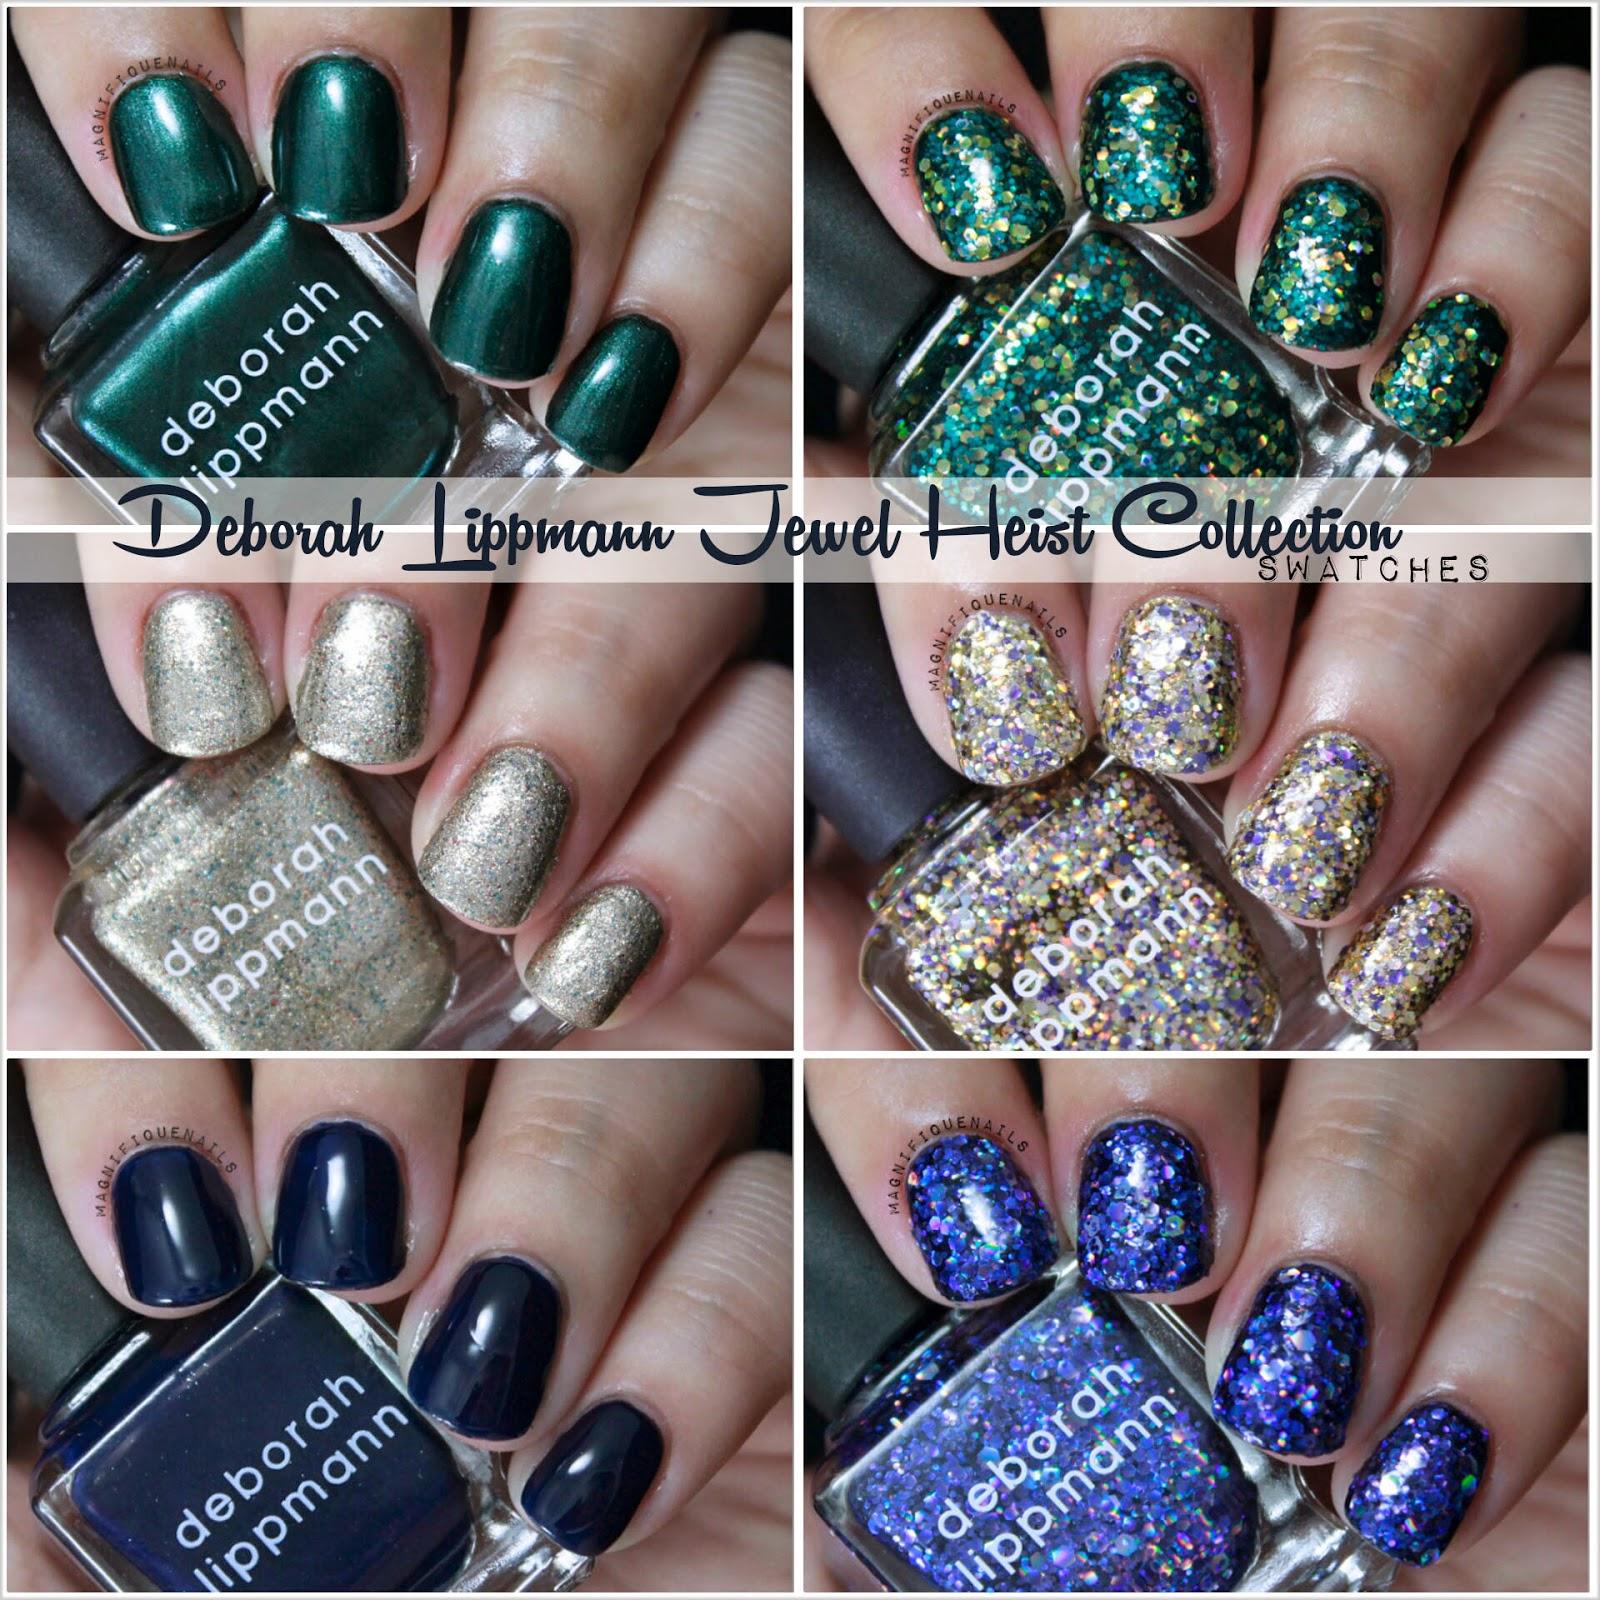 Magically Polished |Nail Art Blog|: Deborah Lippmann Jewel Heist ...